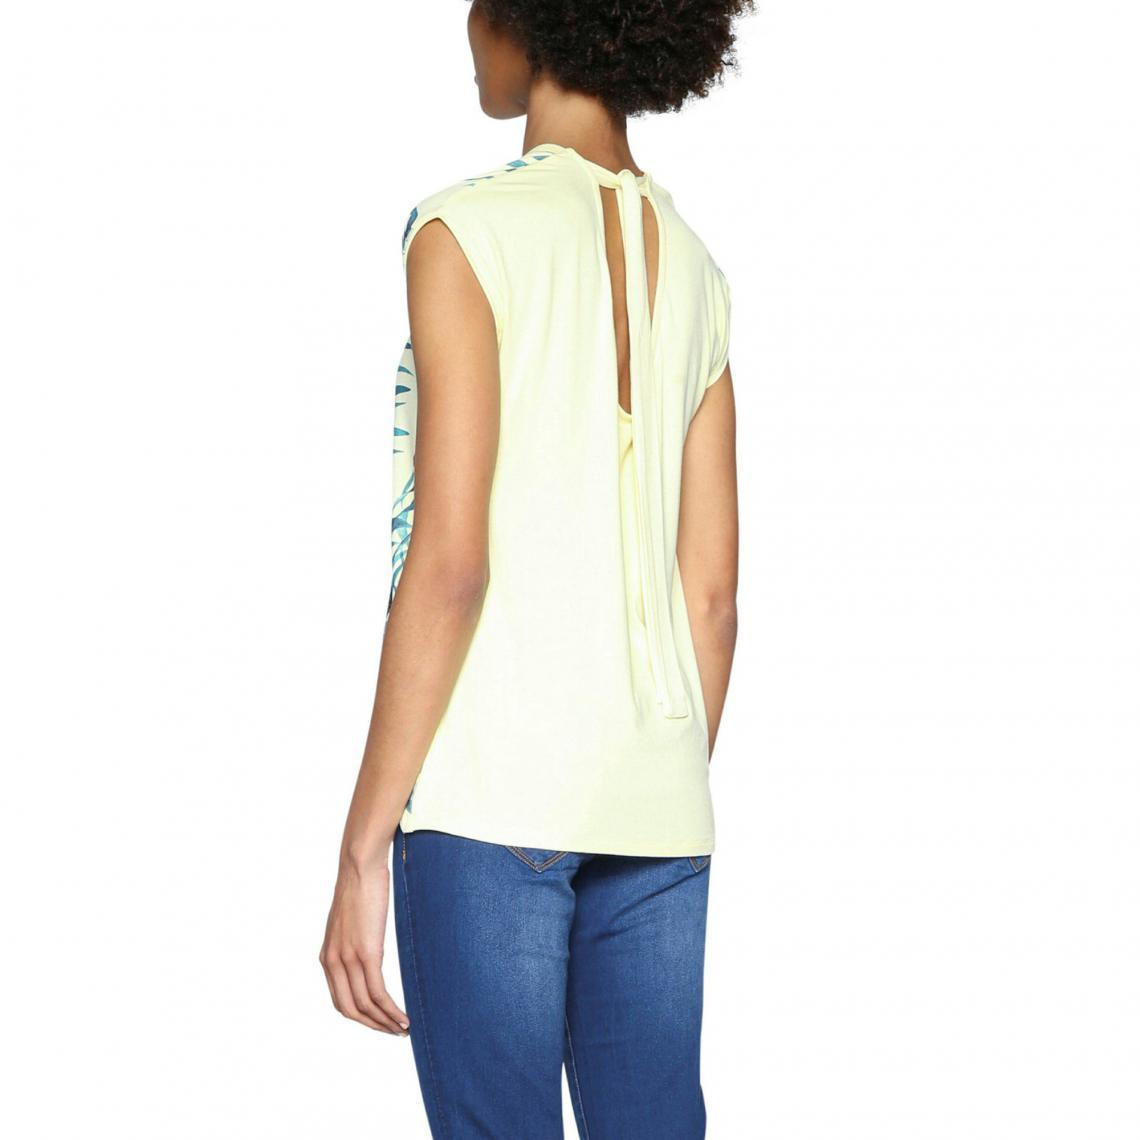 Femme Tee Shirt Jaune3 Manches Desigual Courtes Suisses 2EDYHW9I